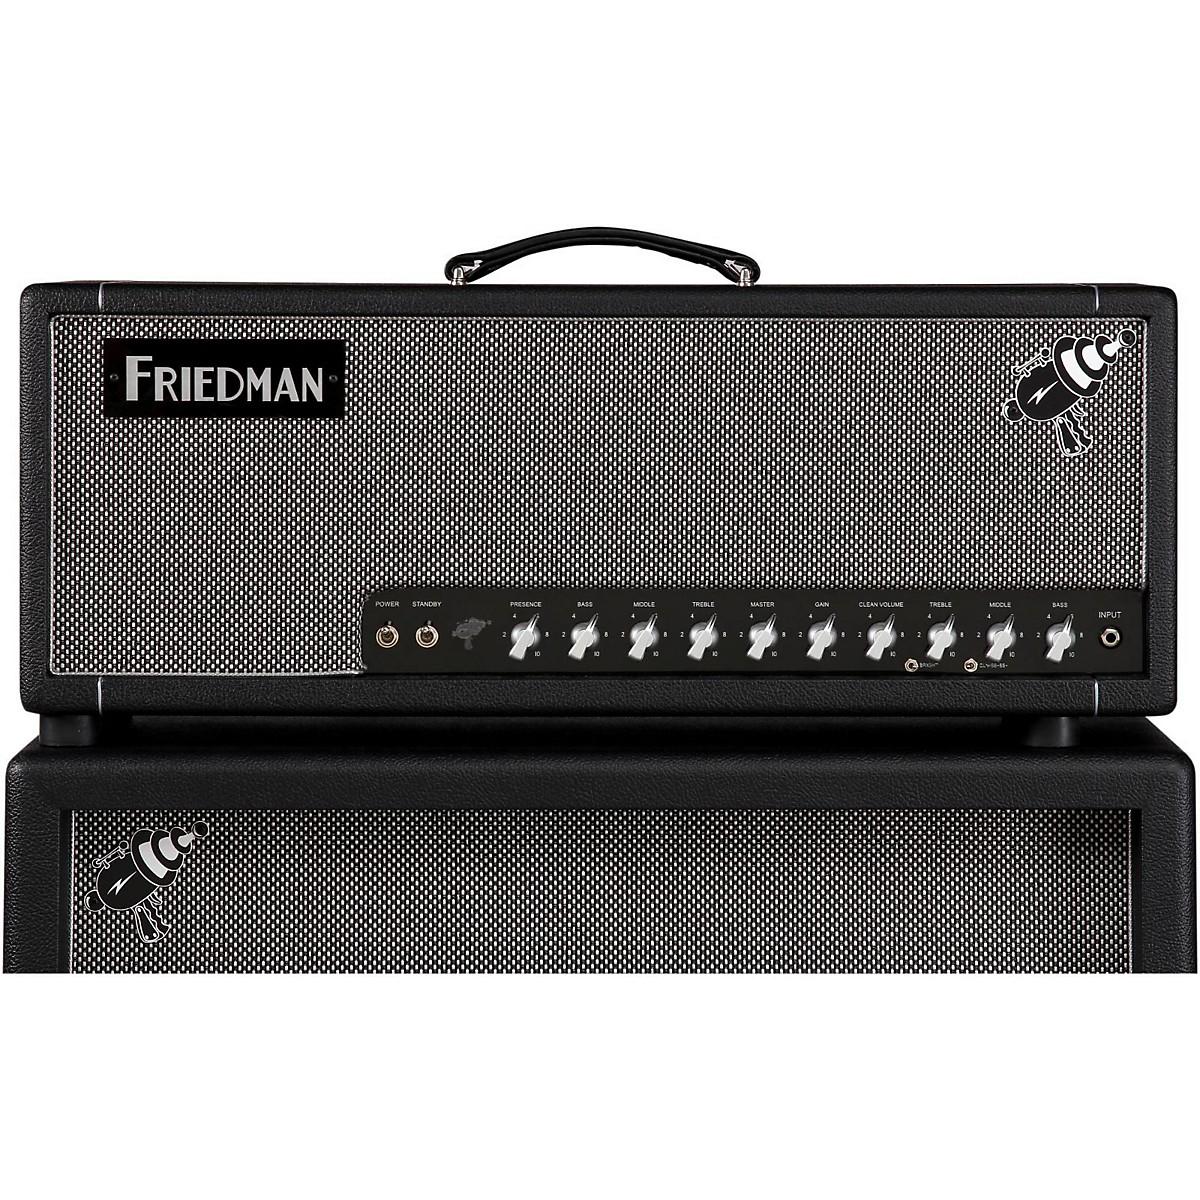 Friedman Steve Stevens Signature 100W Tube Guitar Head